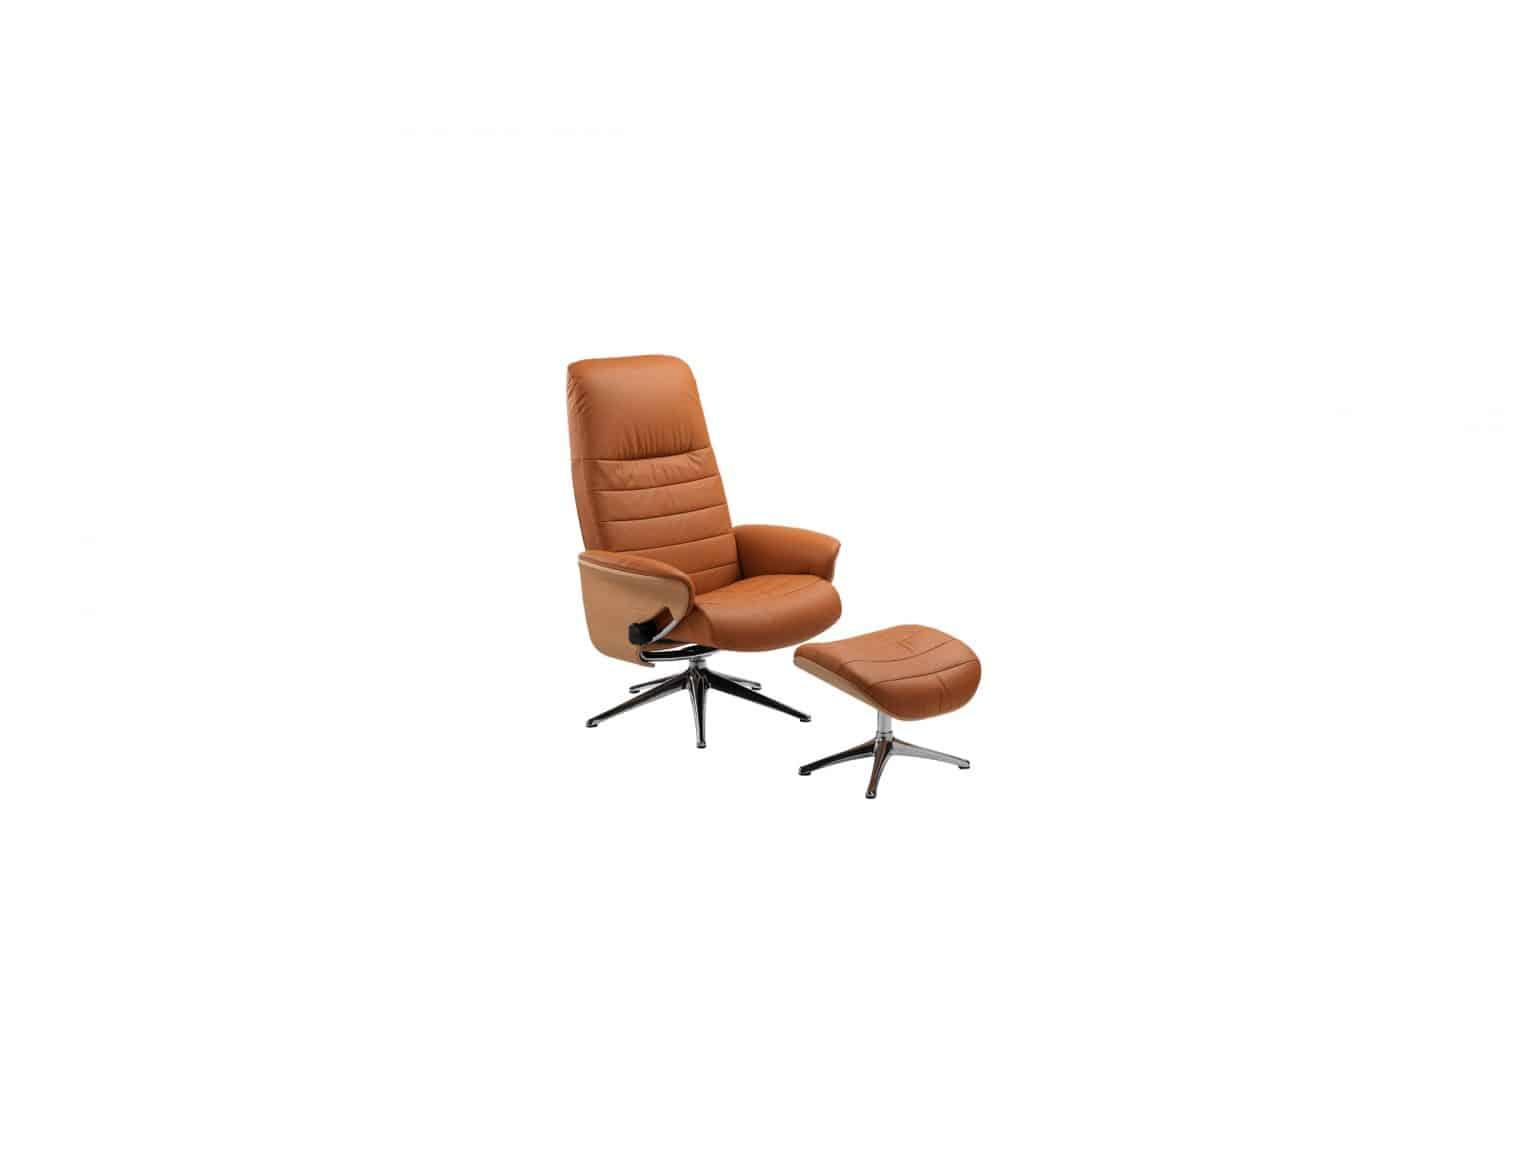 Flexlux fauteuil Horizon pa